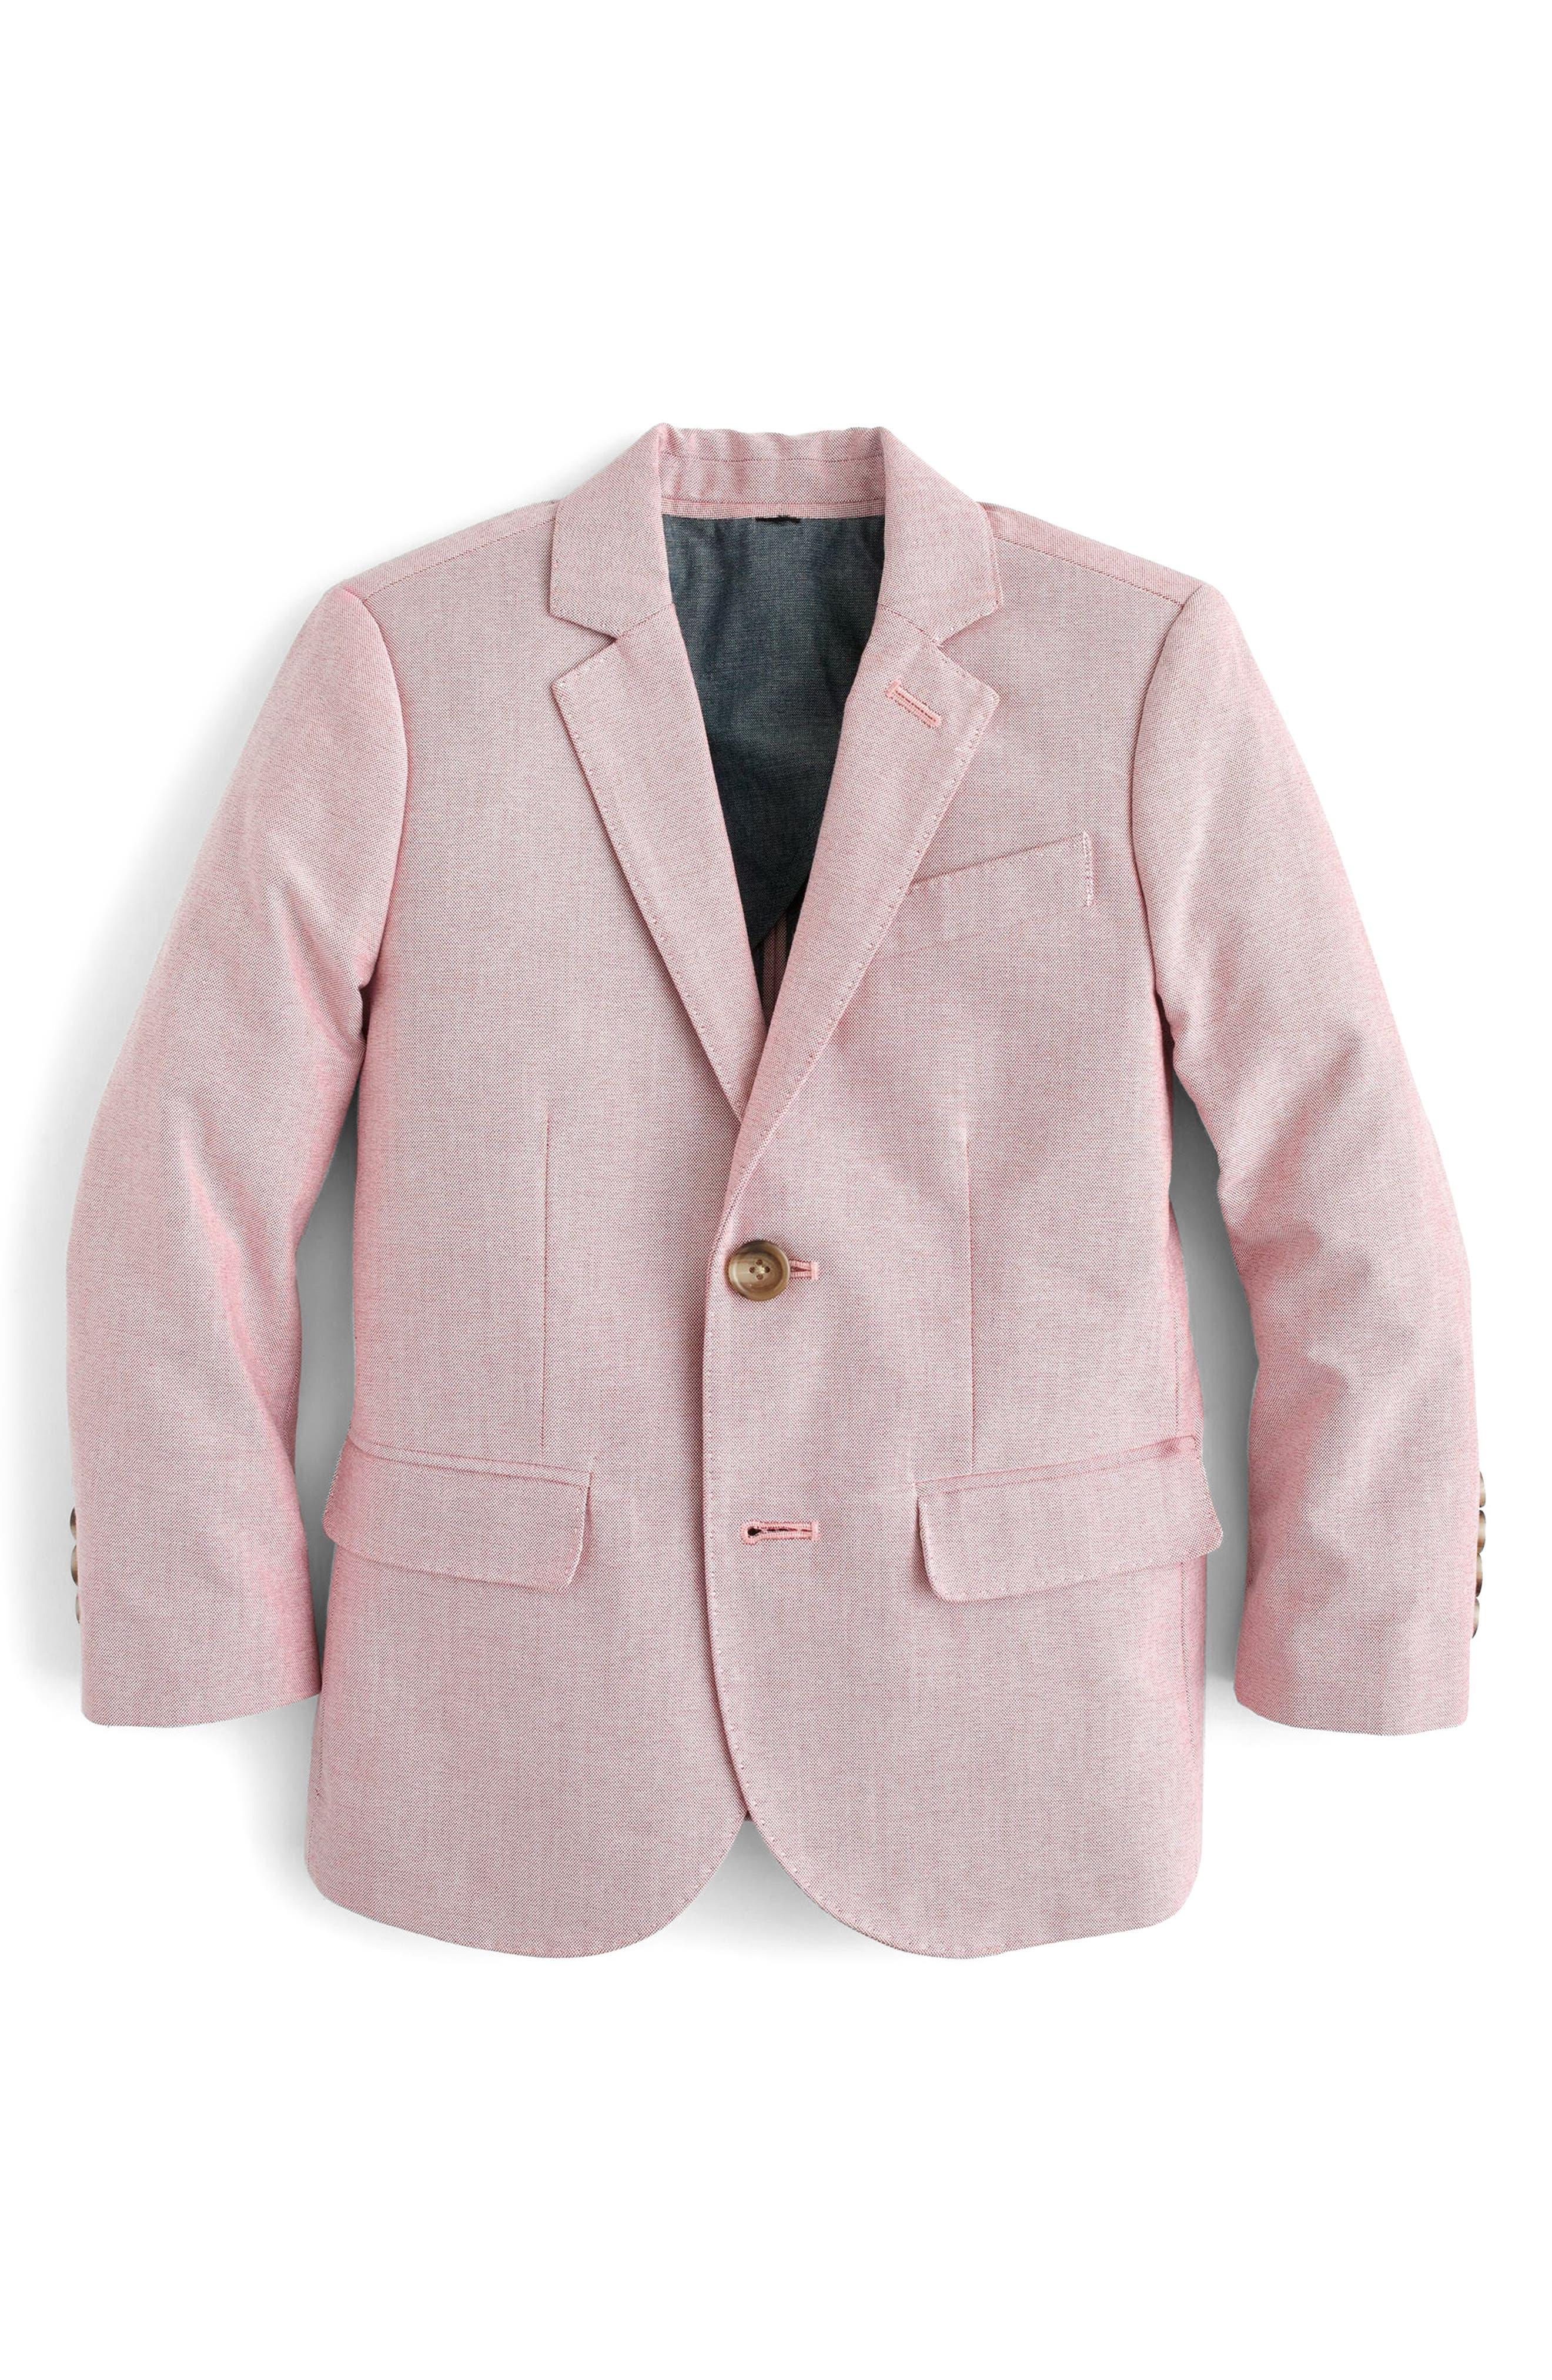 Ludlow Stretch Oxford Suit Jacket,                             Main thumbnail 1, color,                             600